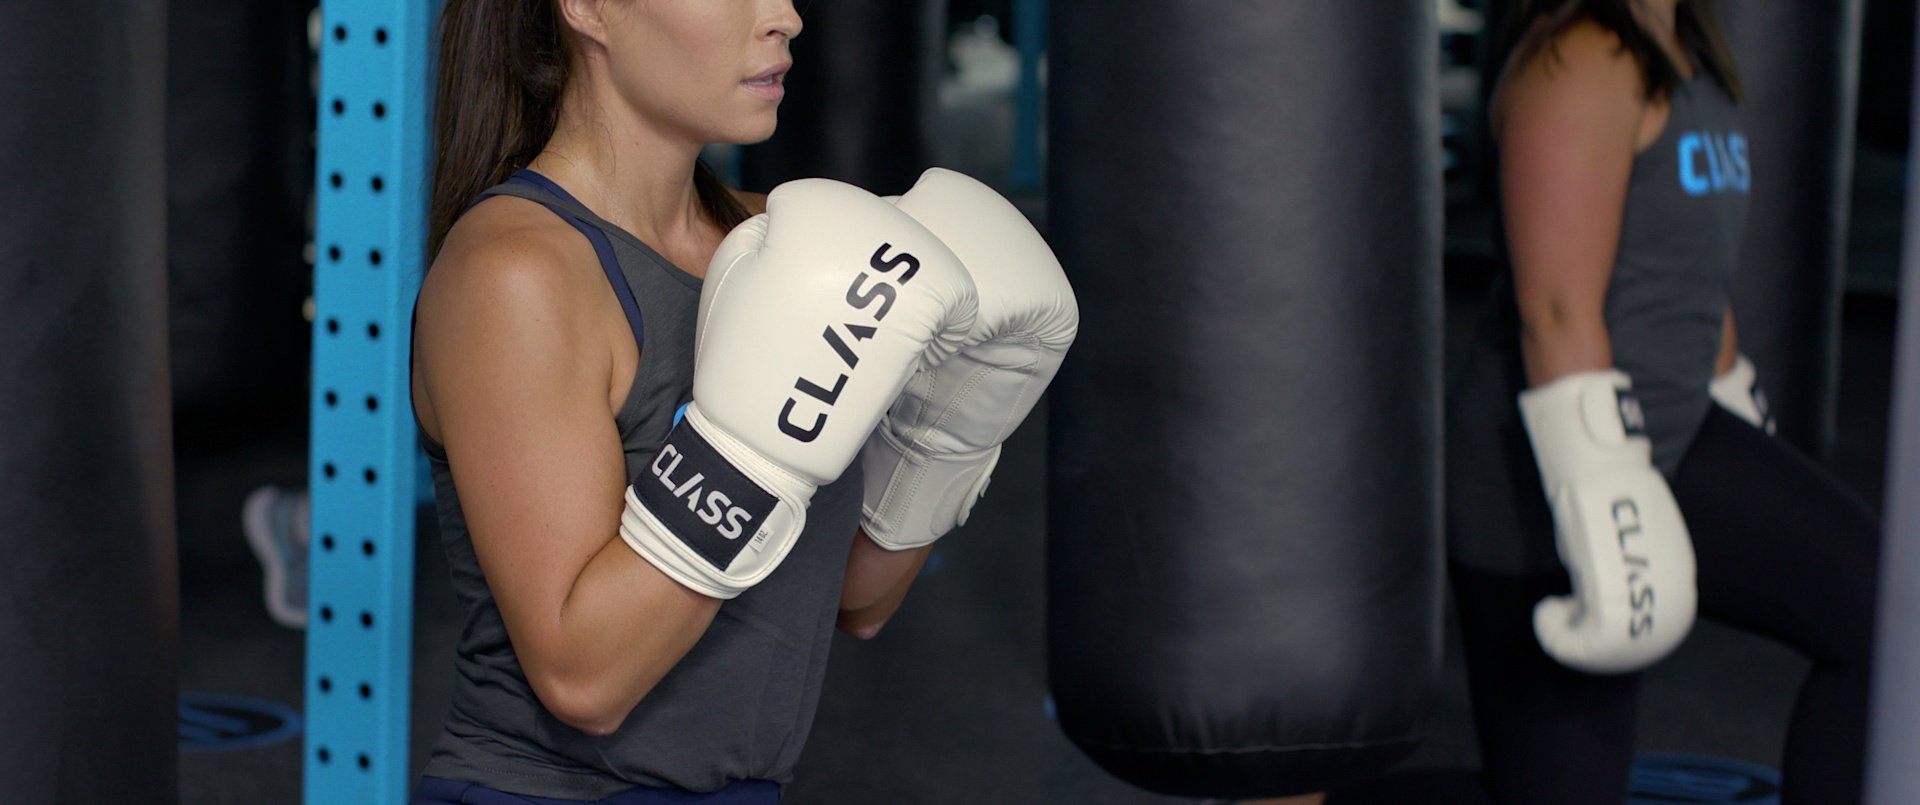 Class Gym San Antonio, TX | Gym Near Me | CLASS UFC GYM San Antonio